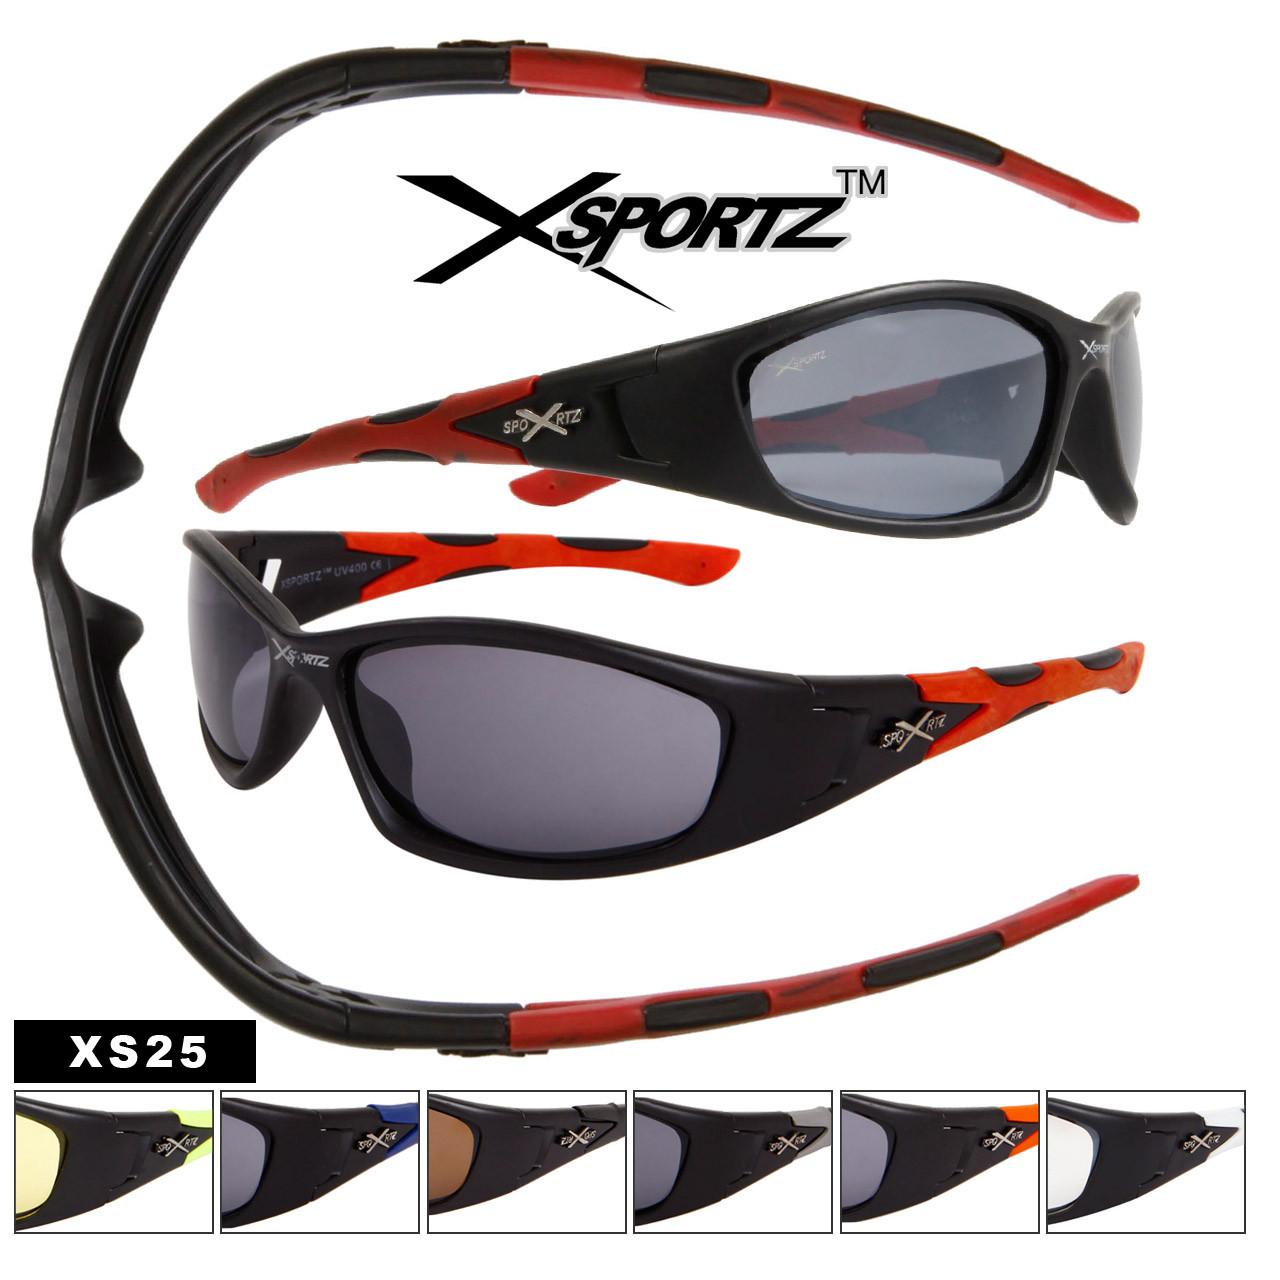 Xsportz™ Sport Sunglasses XS25